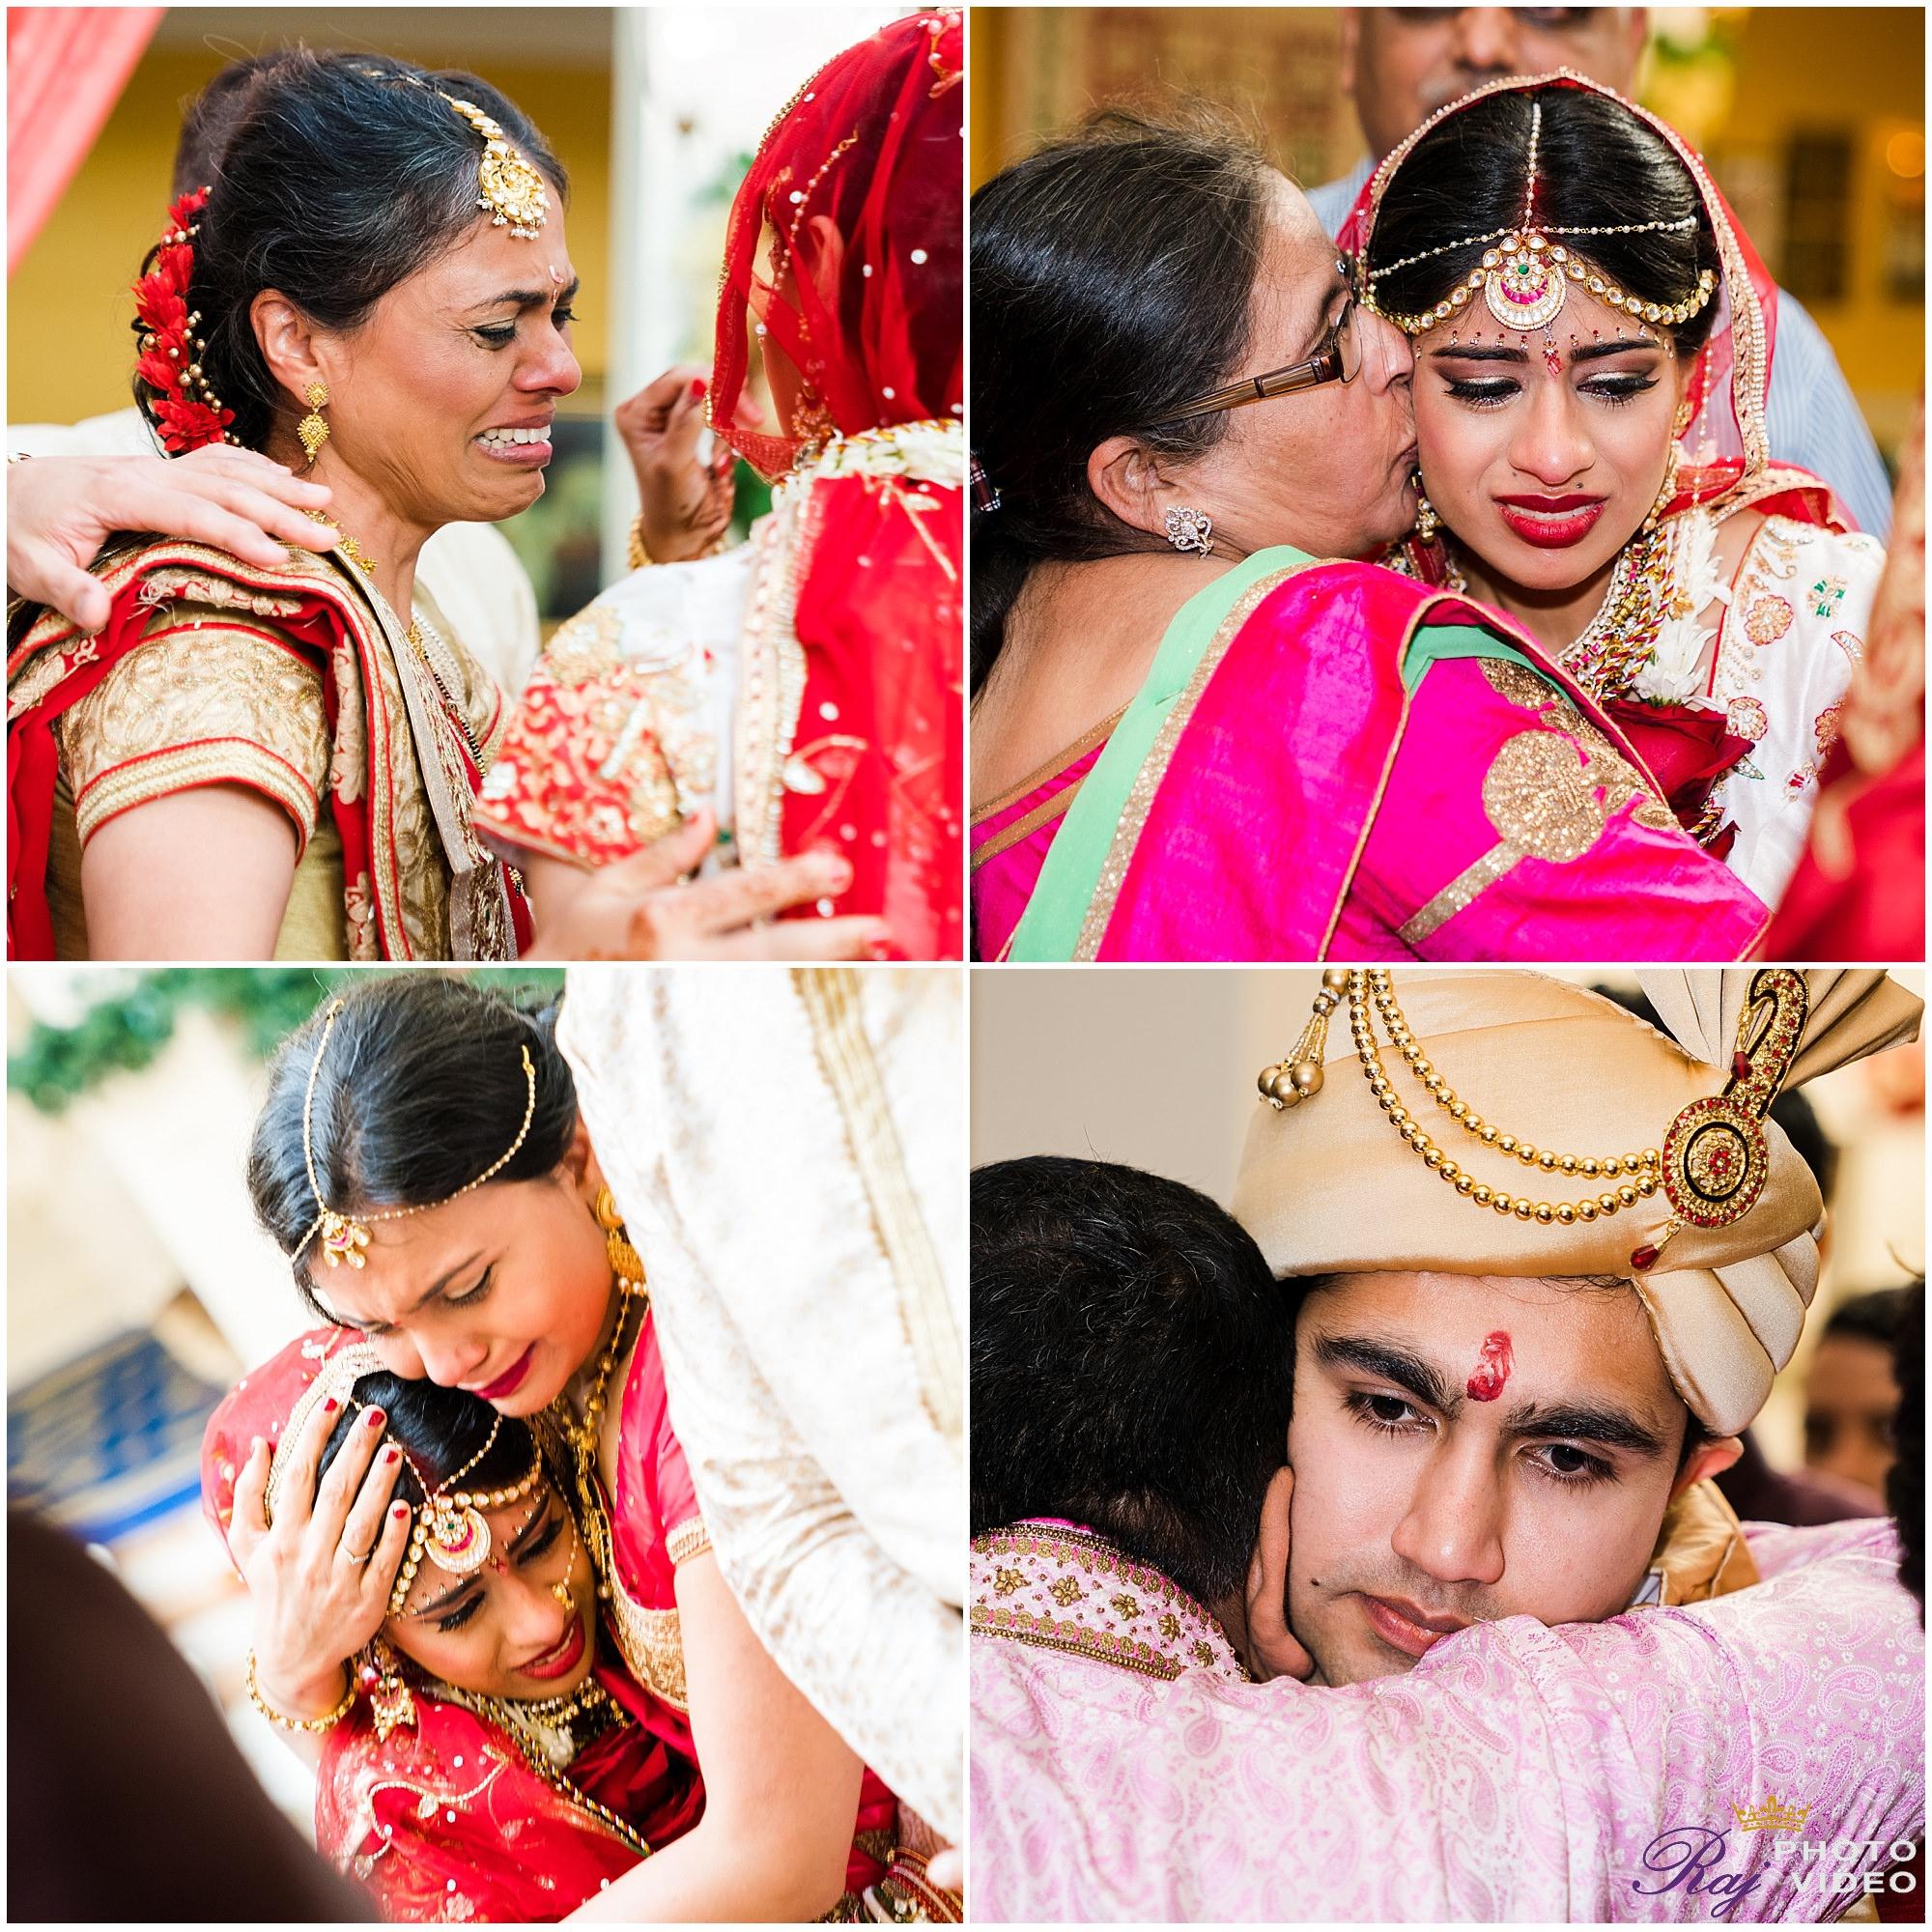 Founders-Inn-and-Spa-Virginia-Beach-VA-Indian-Wedding-Harini-Vivek-50.jpg